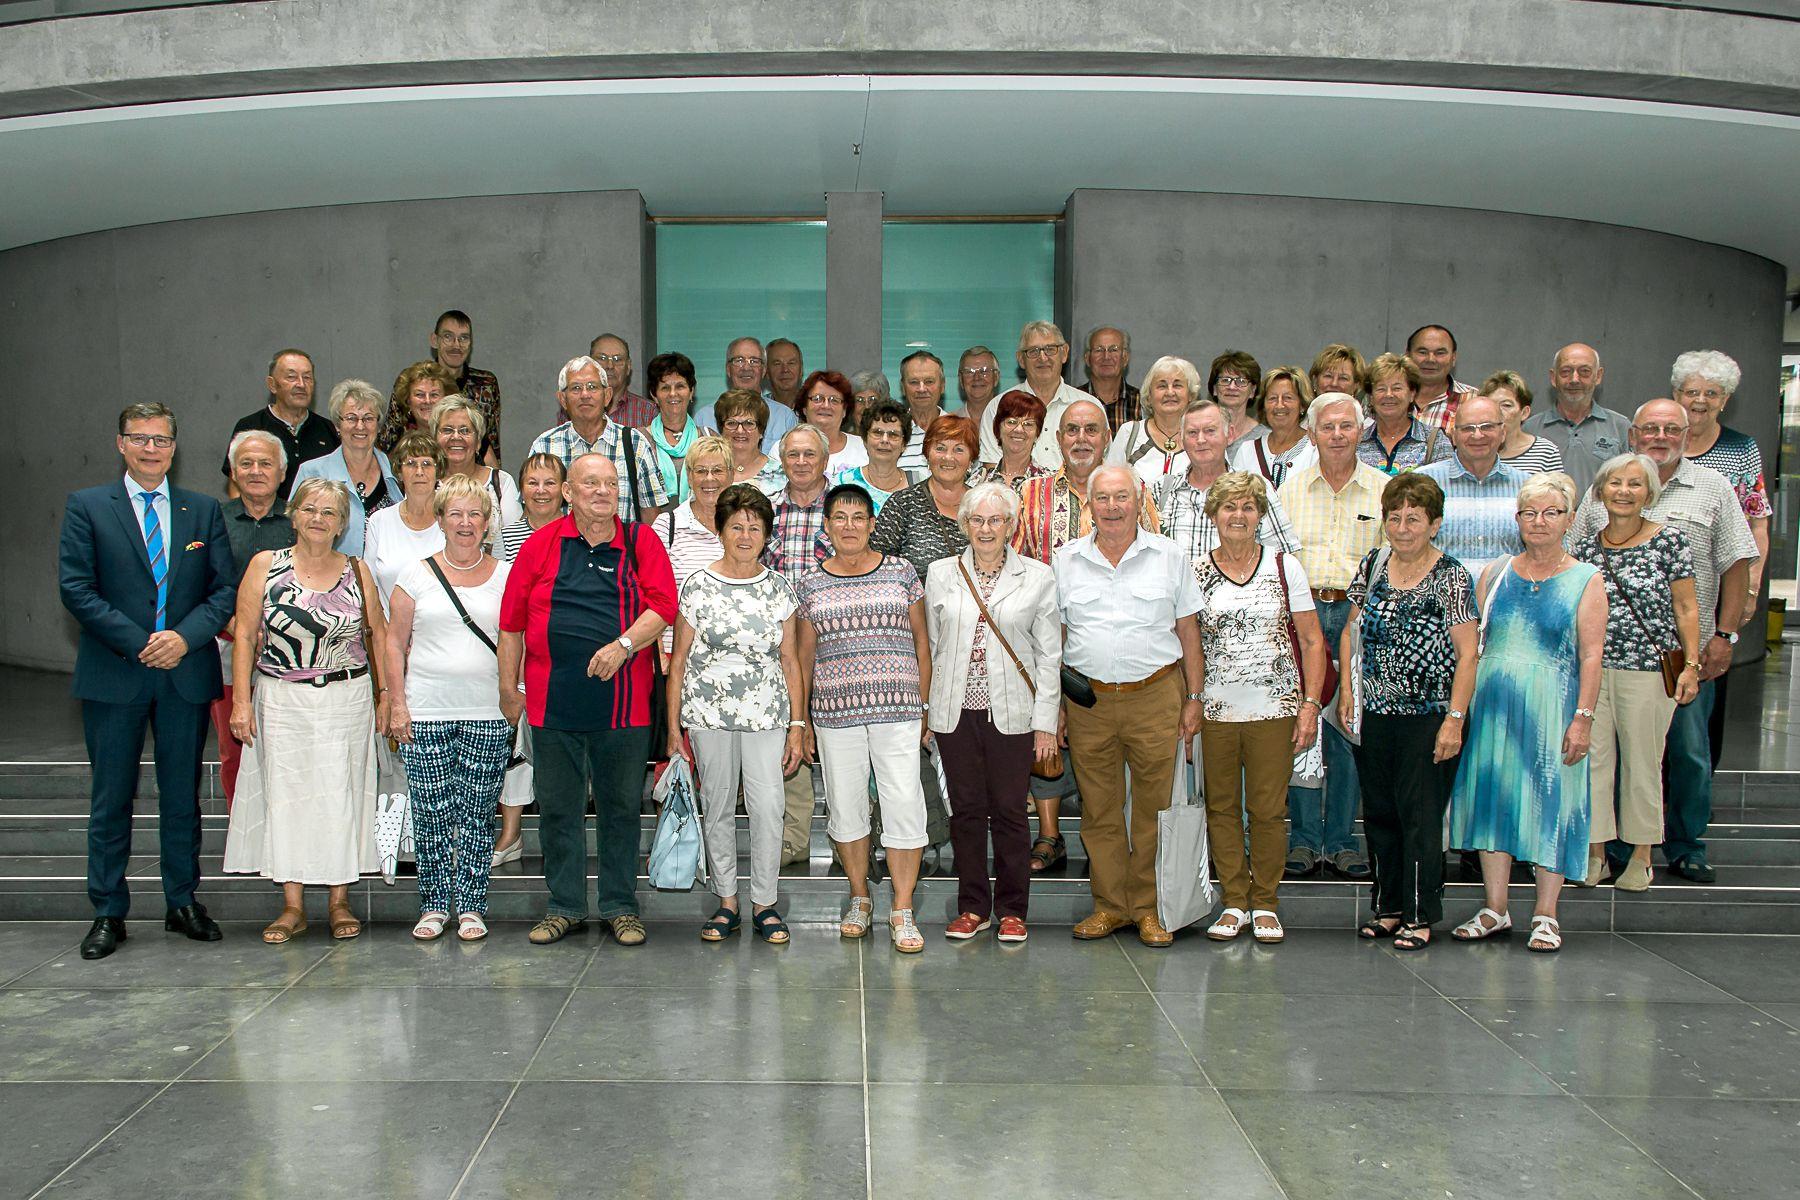 BPA_Gruppenbild_Leipa Seniorenverein_11.12.07.2016